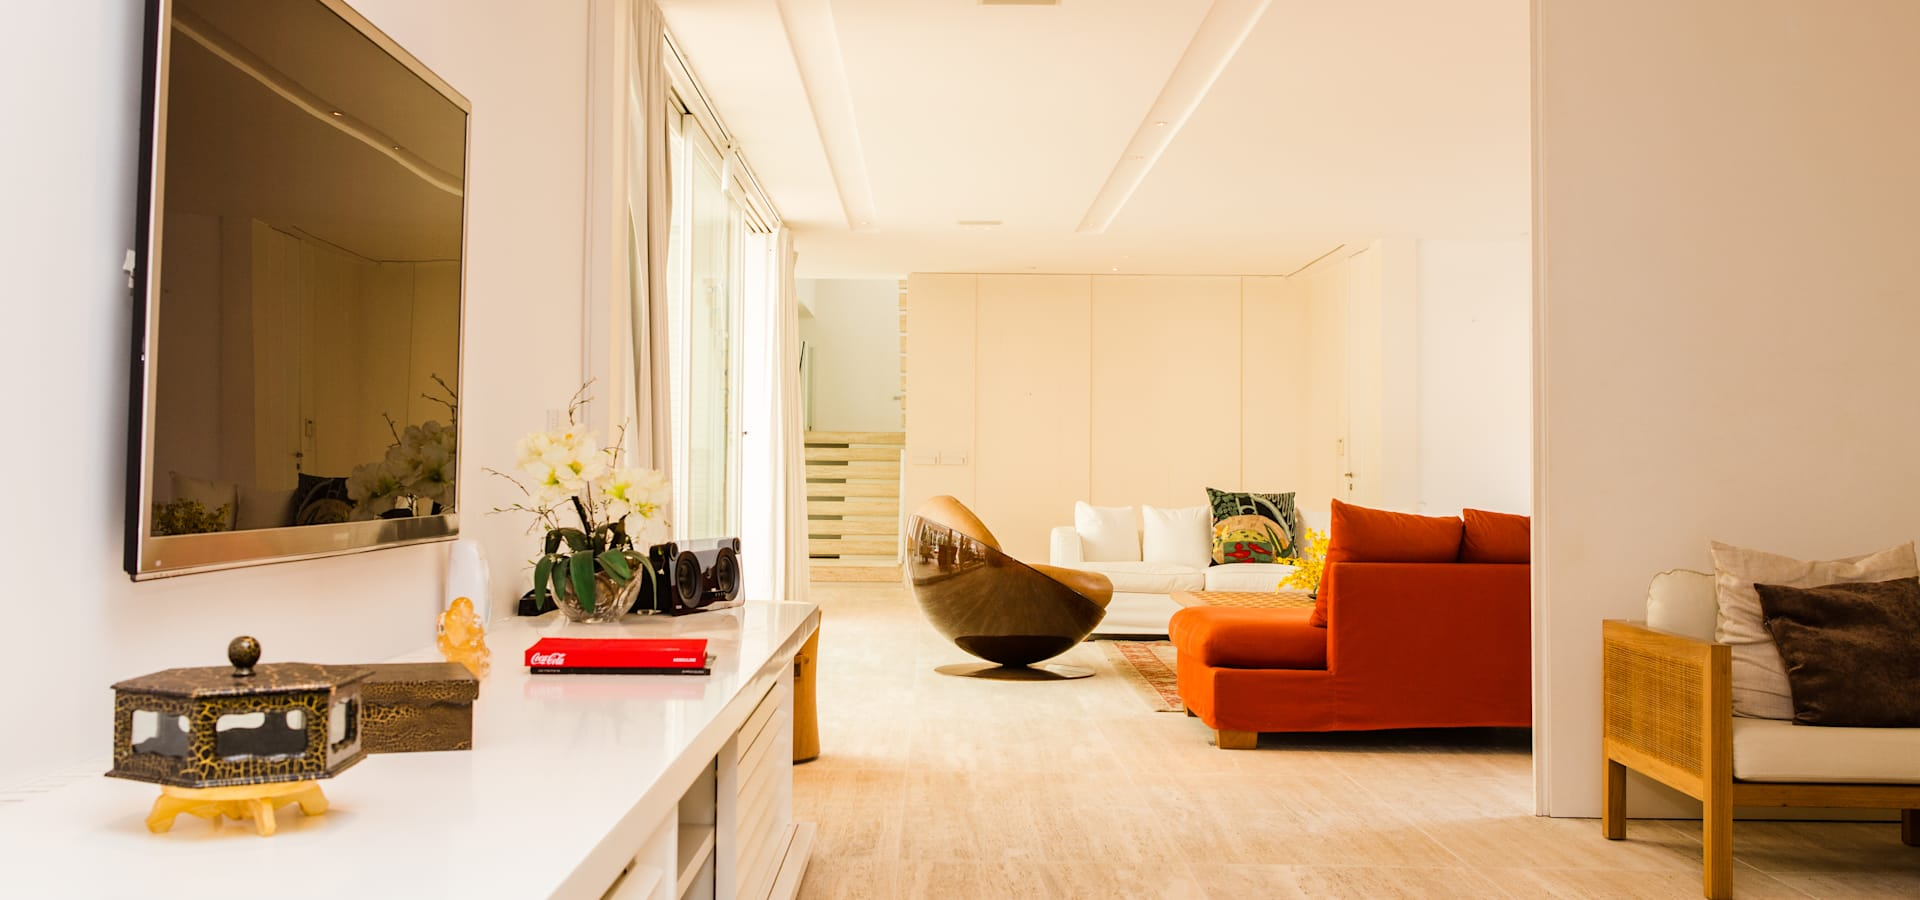 Airbnb Germany GmbH